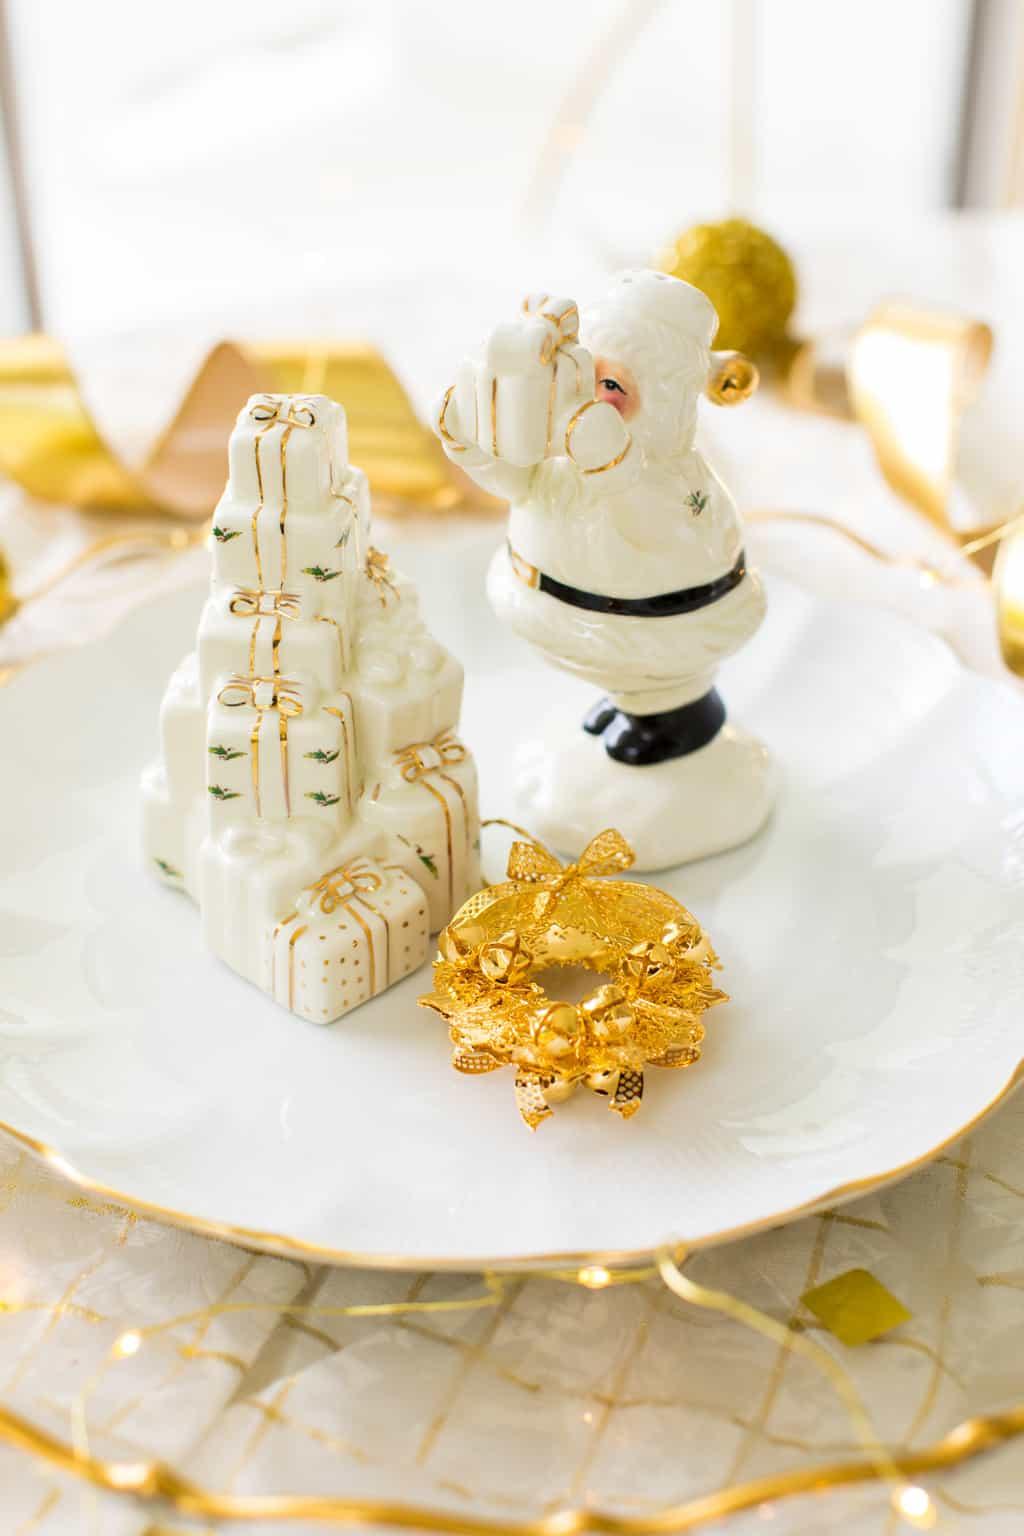 Classic Gold & White Christmas Aesthetic - Santa salt and pepper shakers